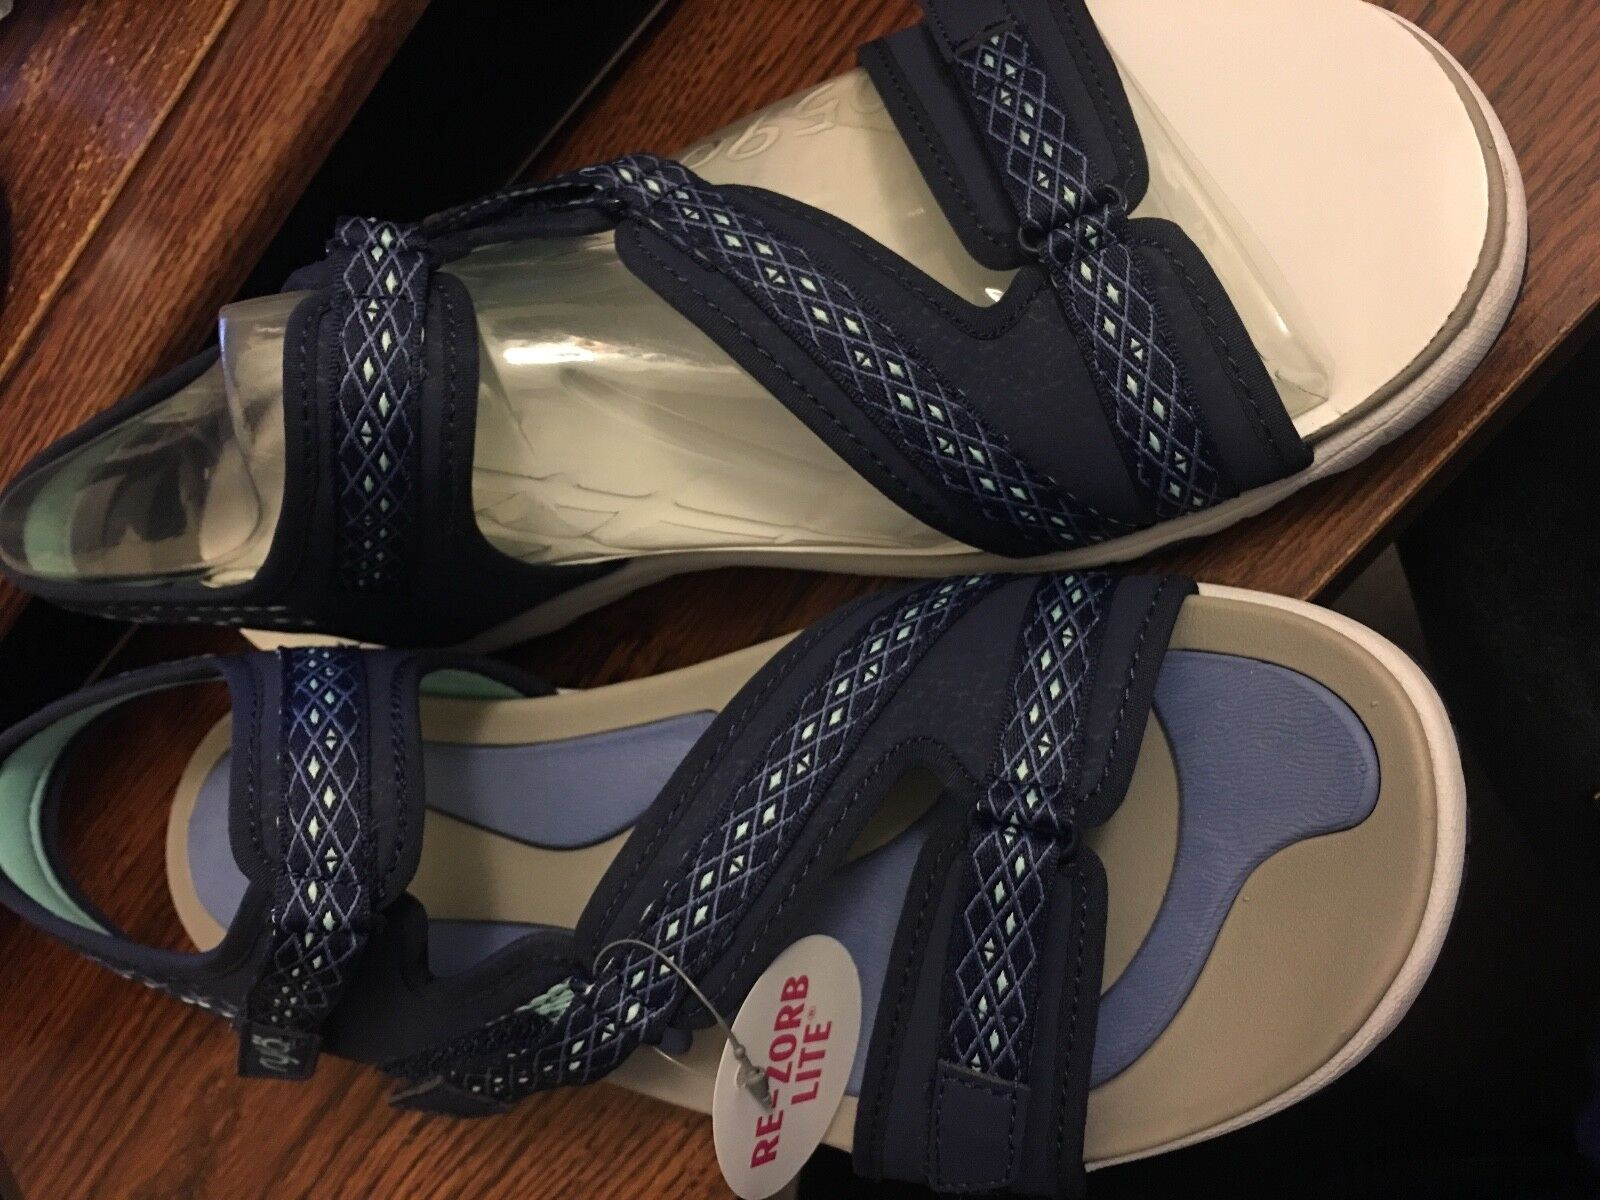 Ryka Women's Savannah Sandal Navy bluee Sports Sneaker Sandals sz 11M